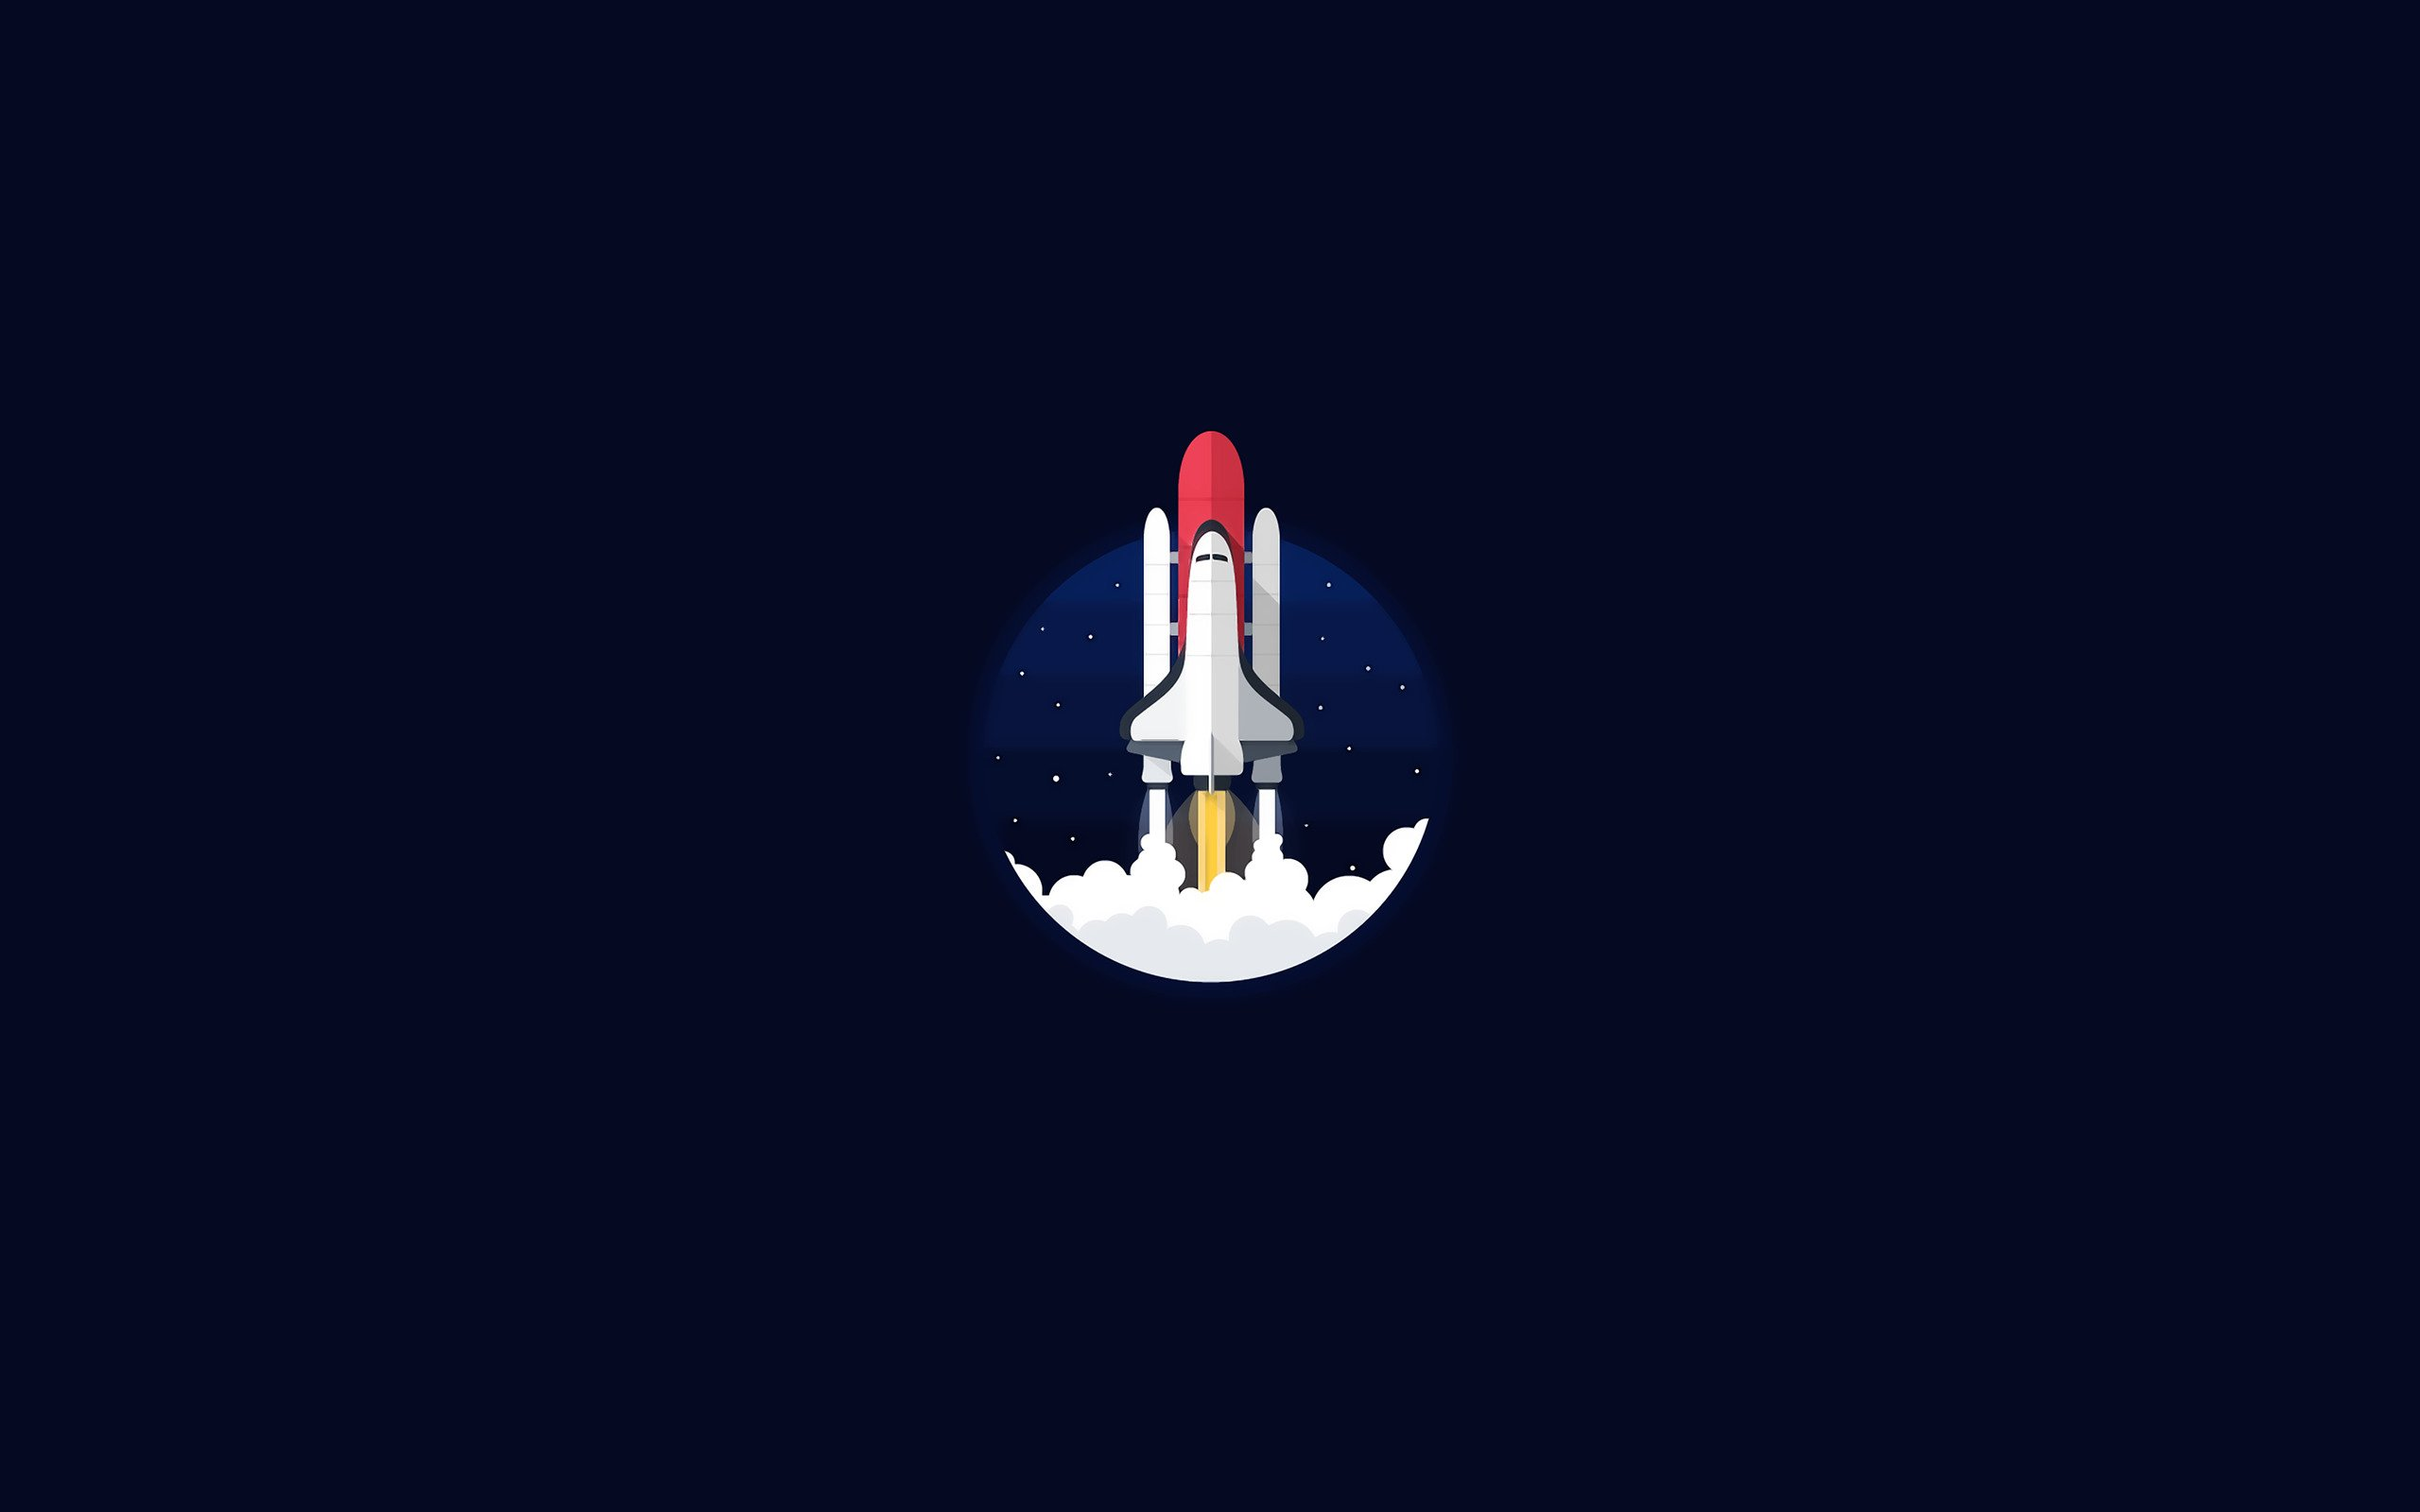 space shuttle, Minimalism, NASA Wallpaper